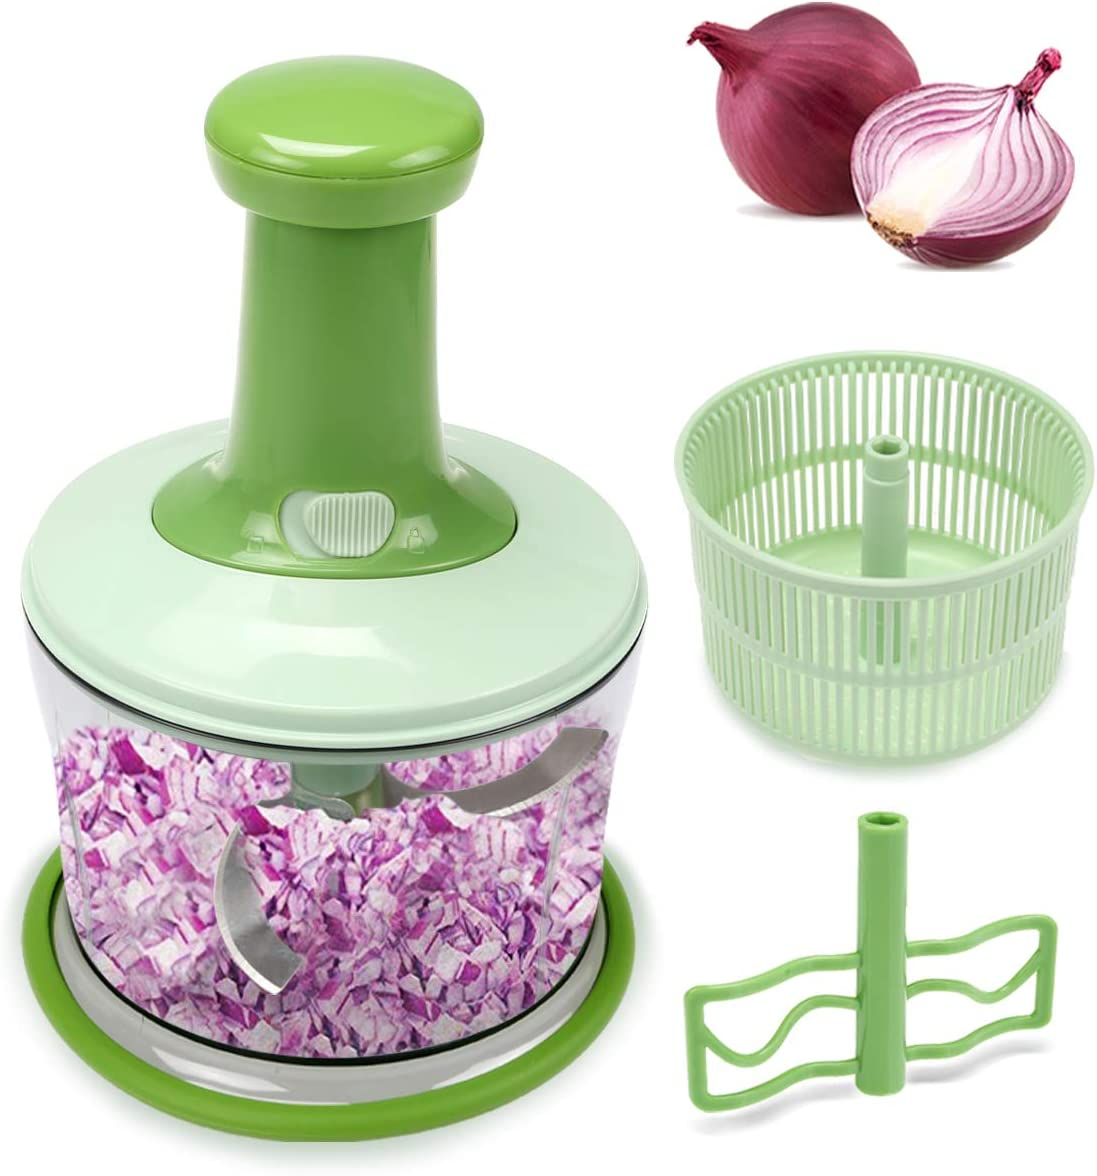 FAVIA 4 Cup Onion Food Chopper for Salsa Pesto Coleslaw Puree, Egg Mixer & Mini Salad Spinner Set - Handheld Mincer to Chop Nuts Vegetables Fruits Herbs Seasonings - BPA Free Dishwasher Safe